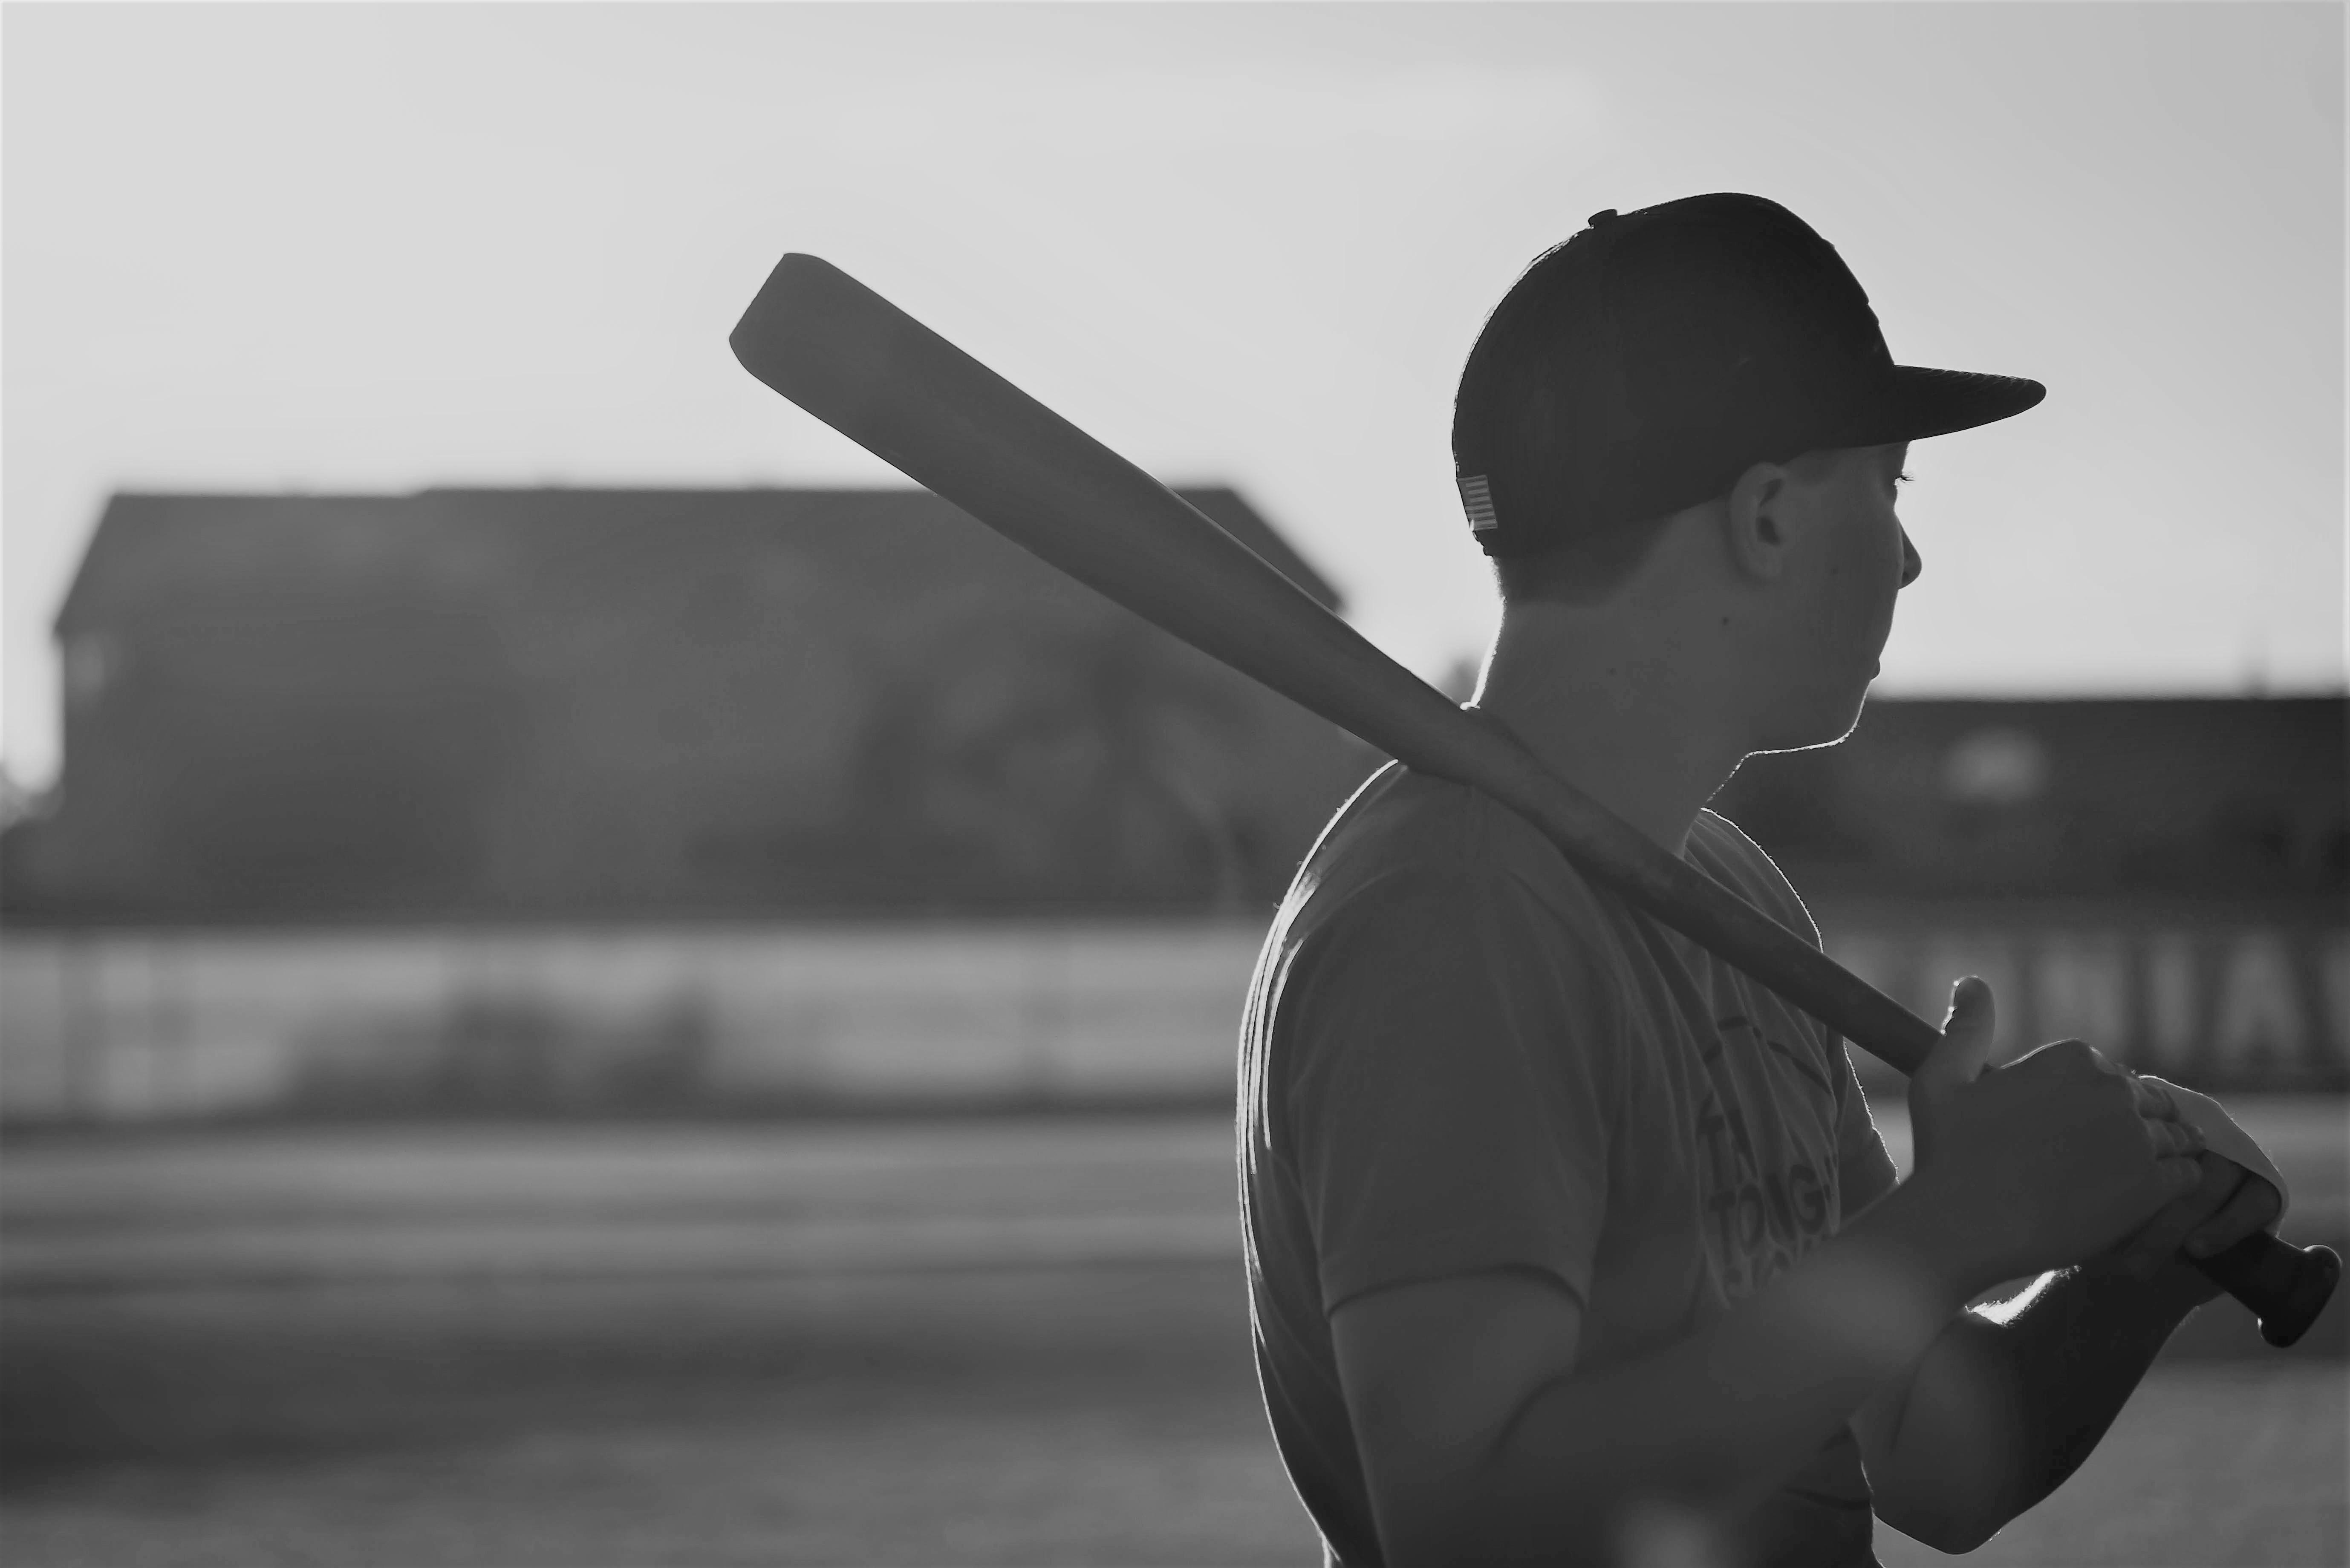 Baseball Hitting Training Aids Teaching Sports